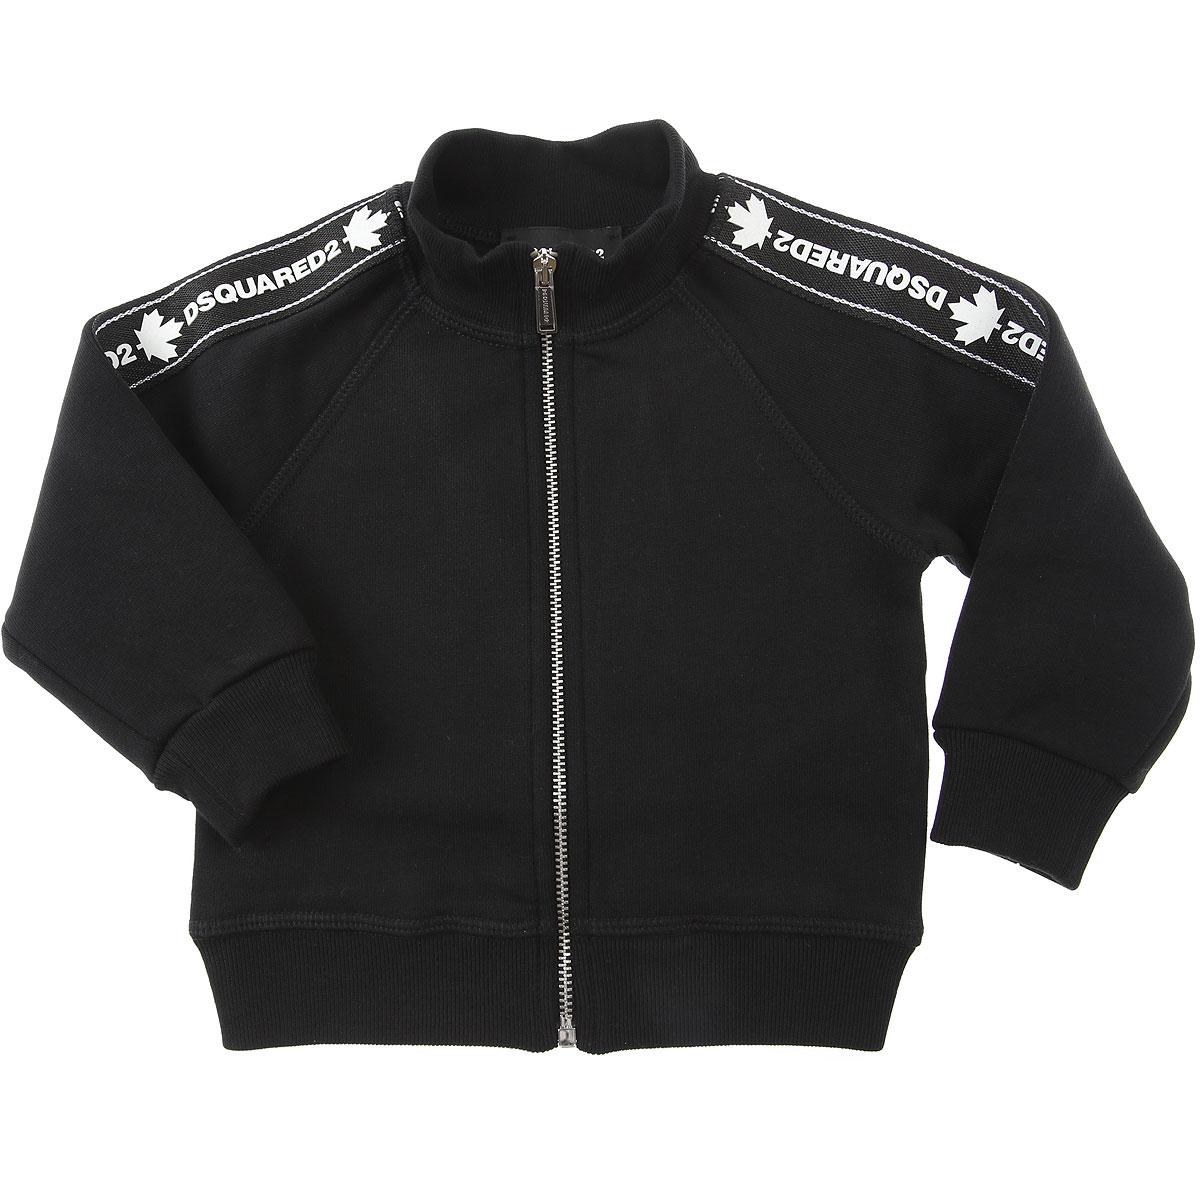 Dsquared2 Baby Sweatshirts & Hoodies for Boys On Sale, Black, Cotton, 2019, 12 M 18M 3Y 9M